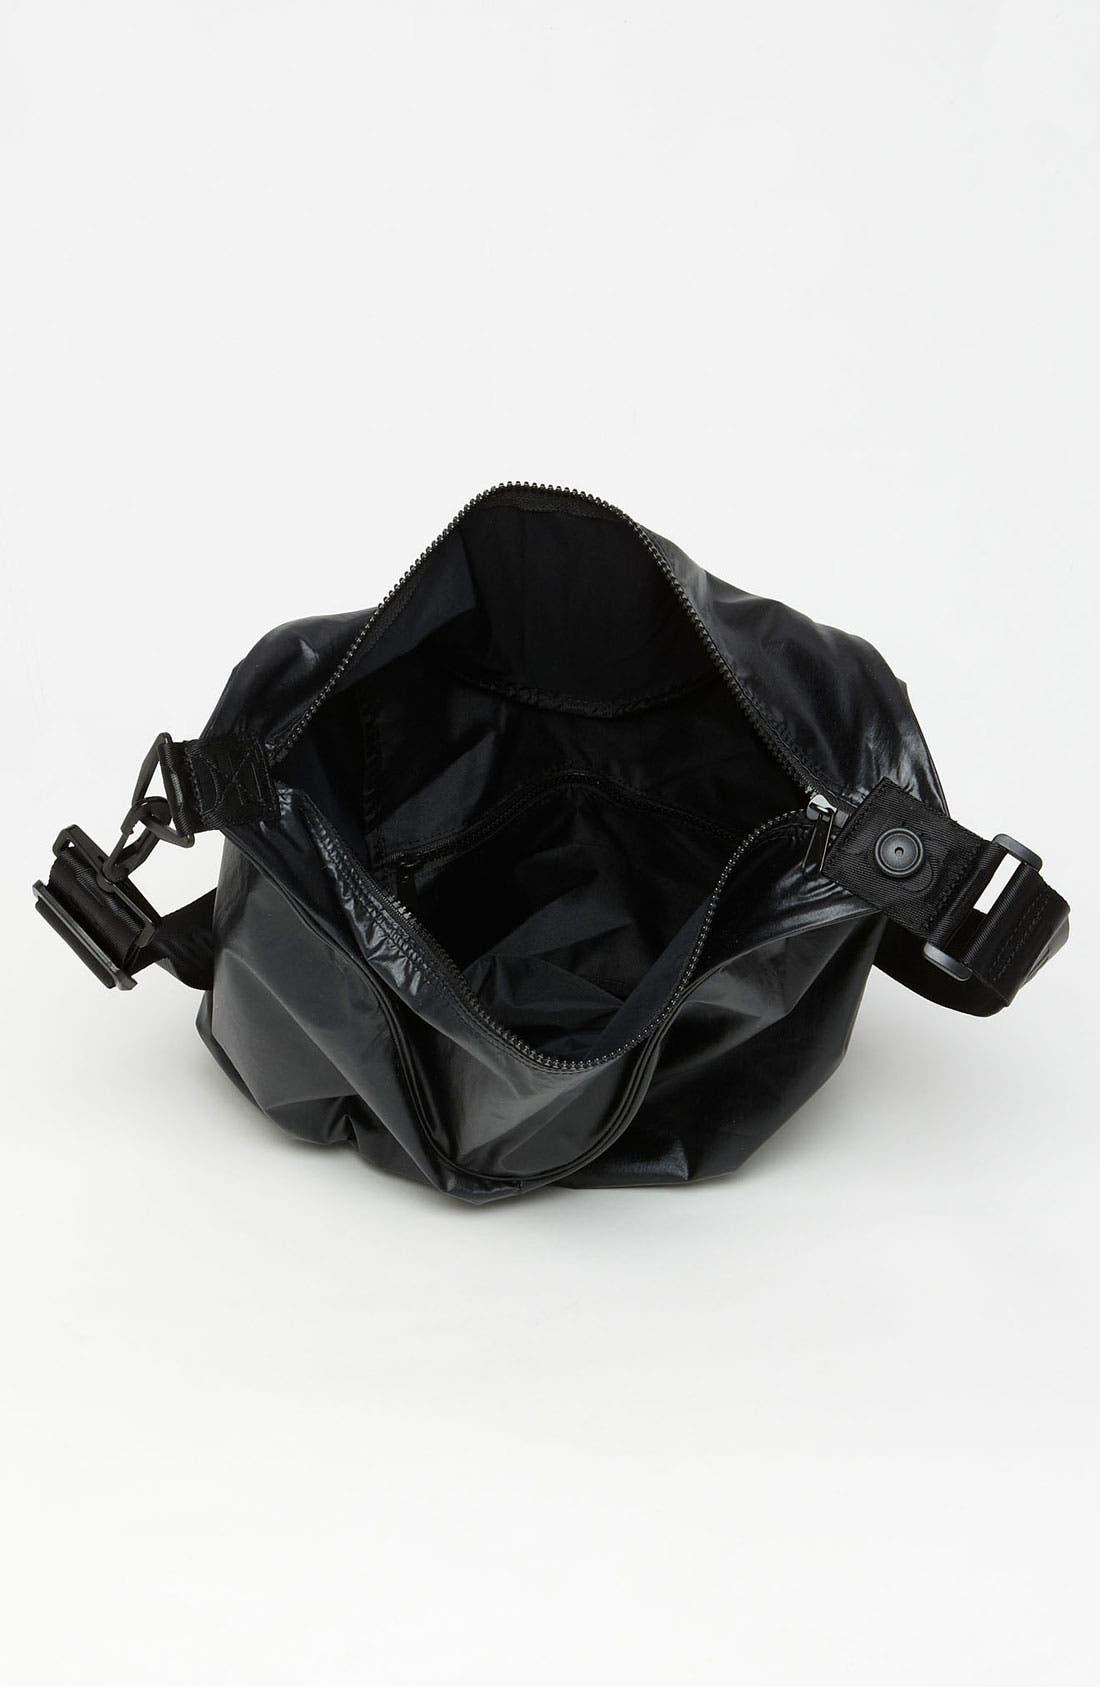 NIKE,                             'Bucket' Sling Bag,                             Alternate thumbnail 6, color,                             030